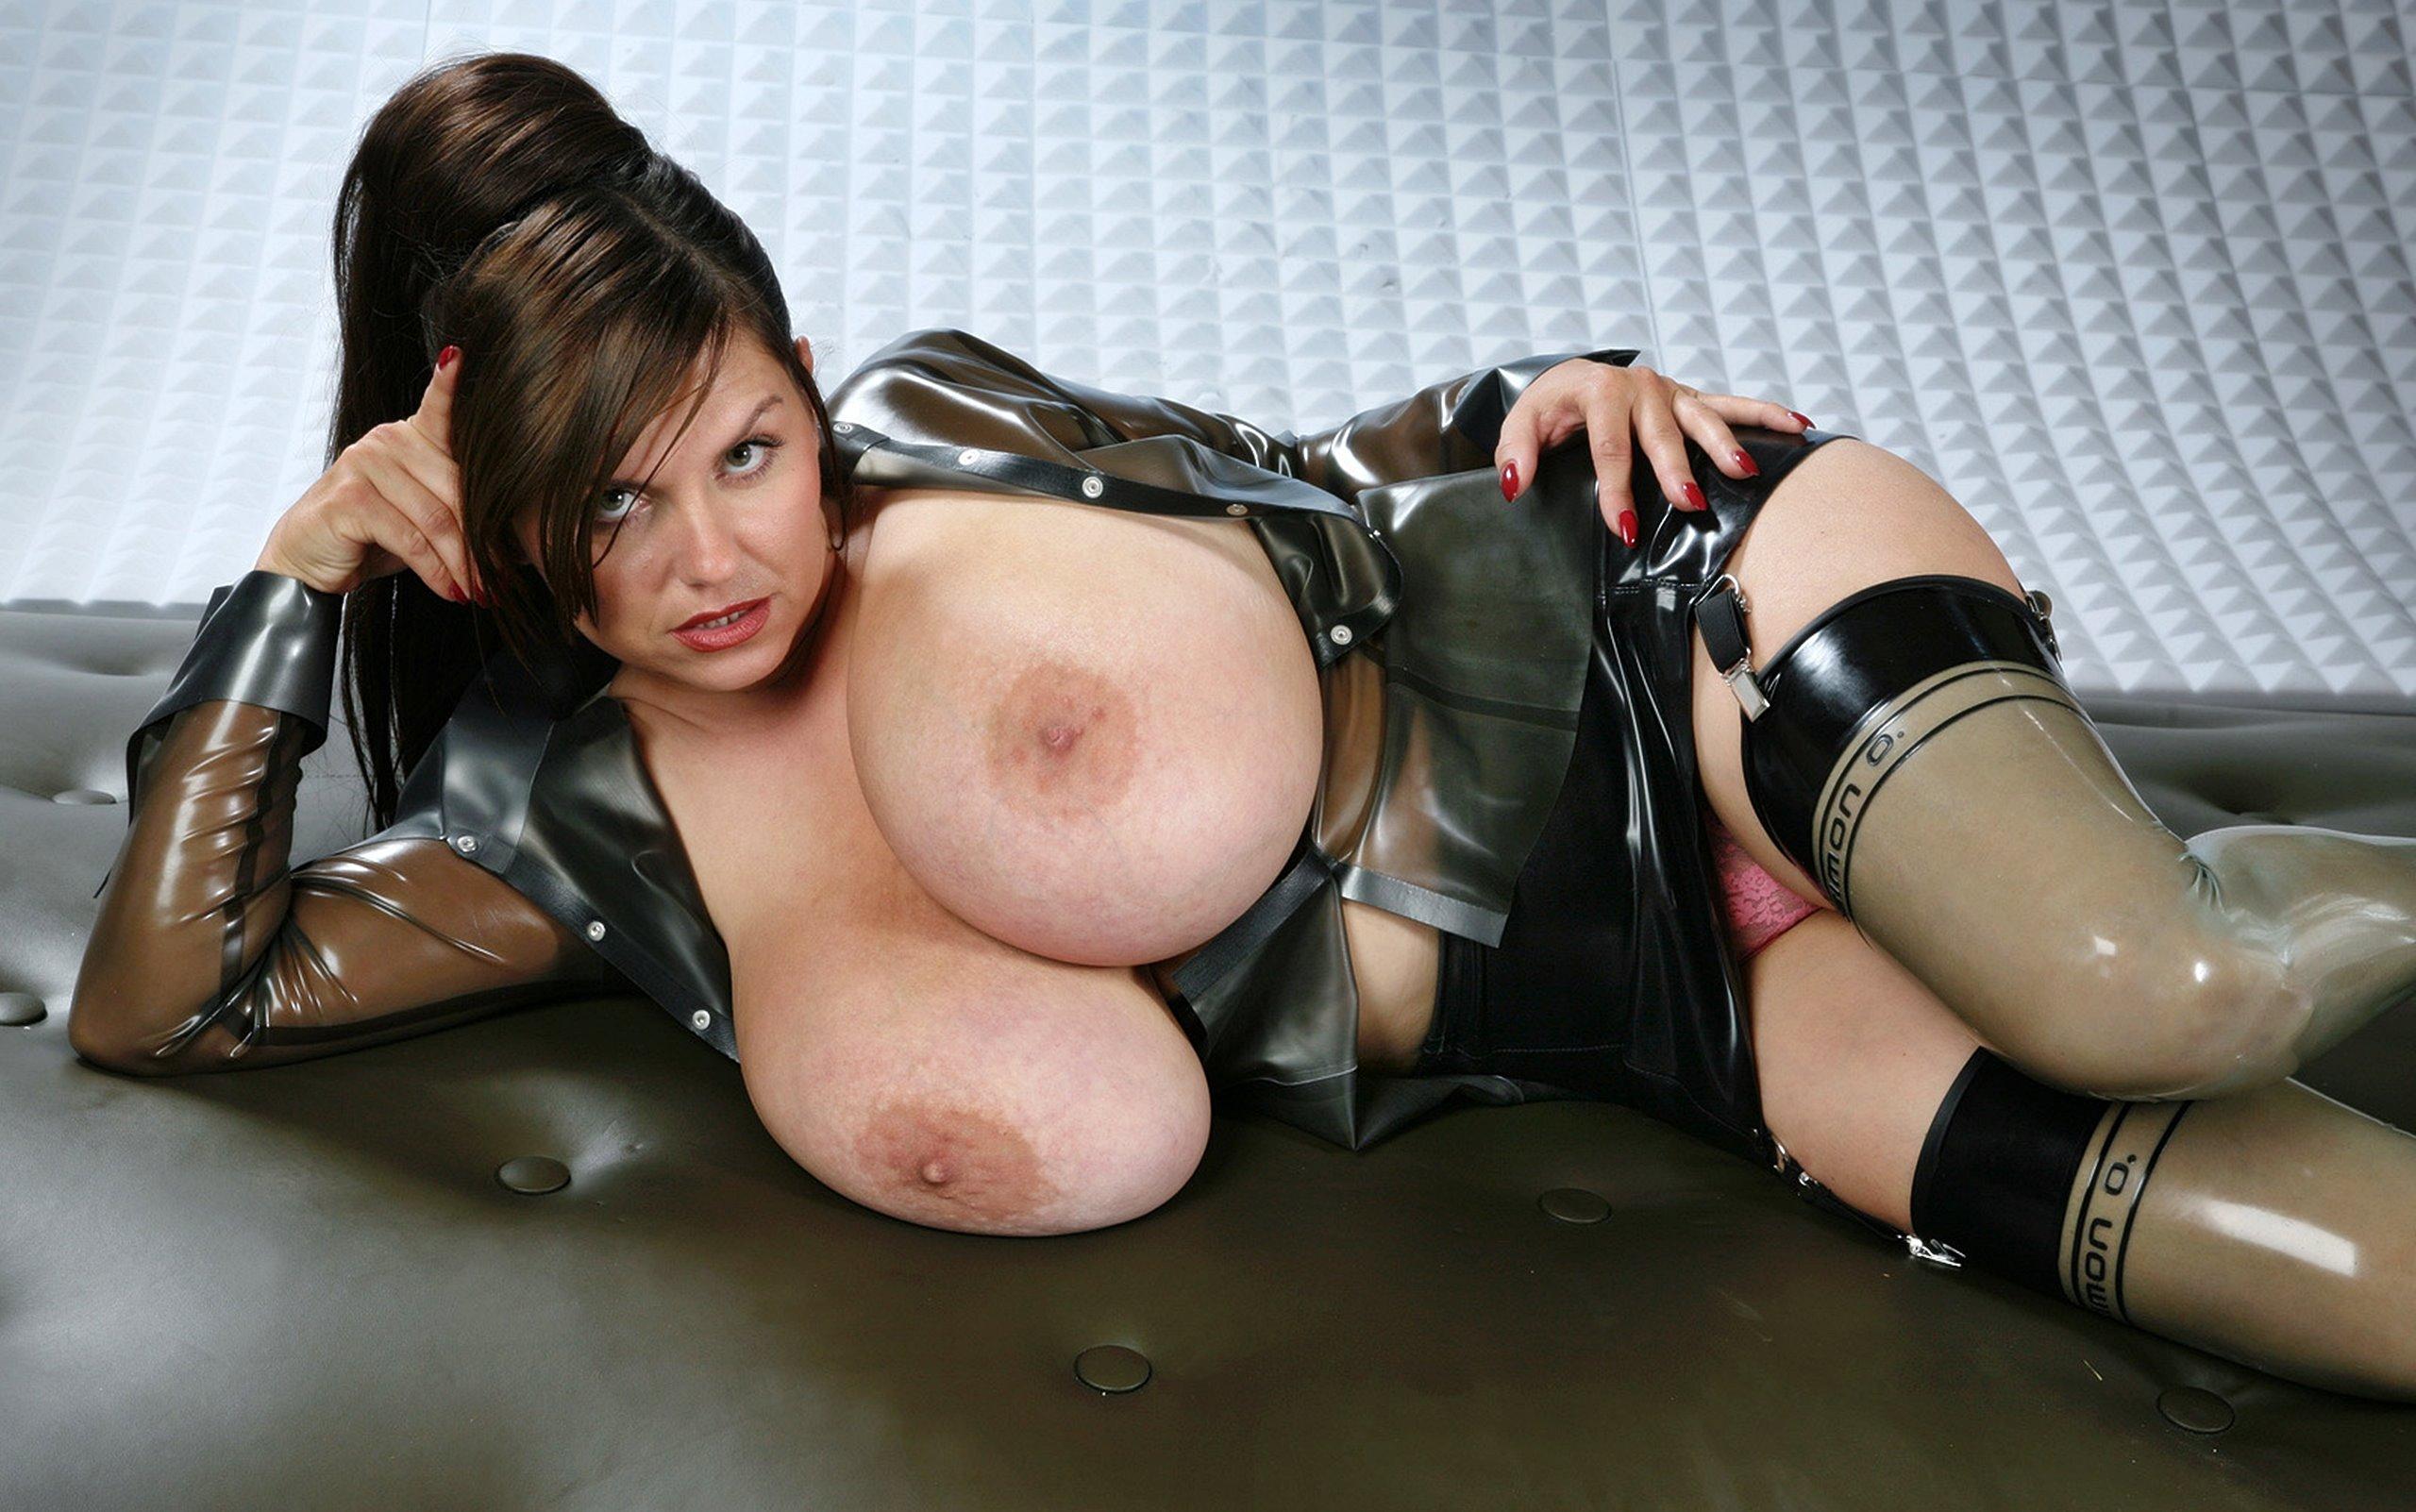 Big boobs dominatrix galleries